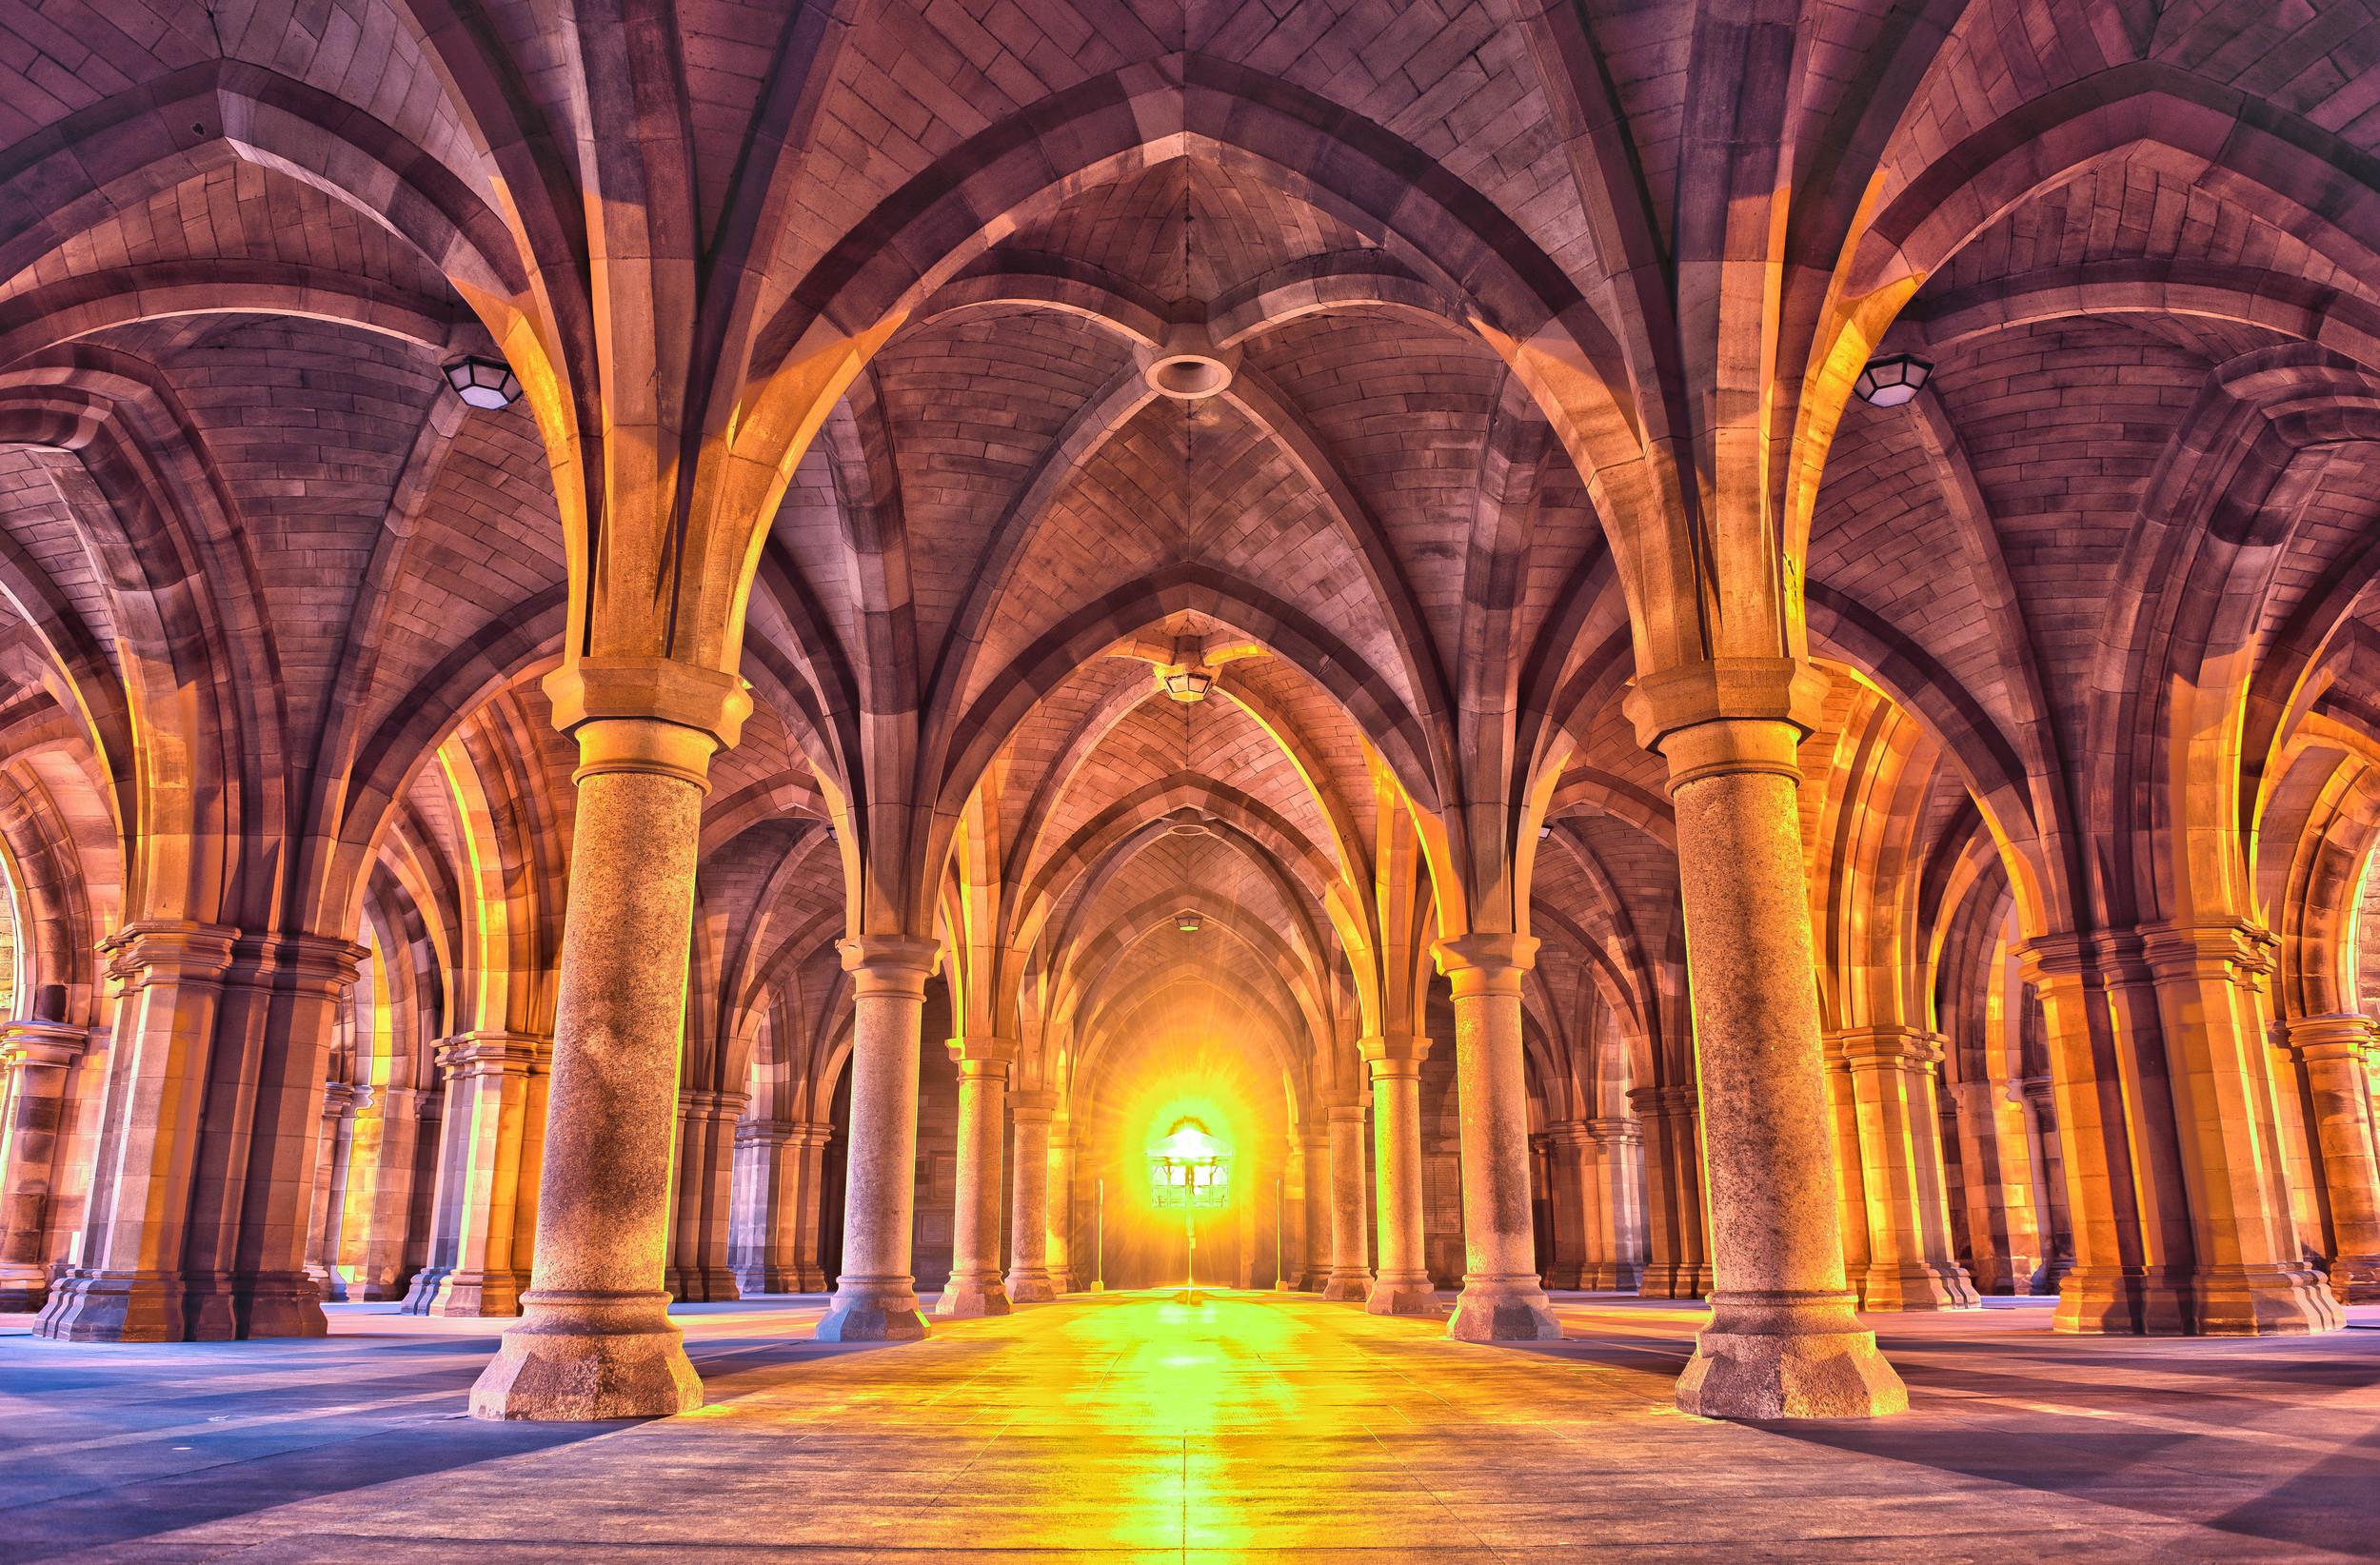 Glasgow University_HDR2.jpg